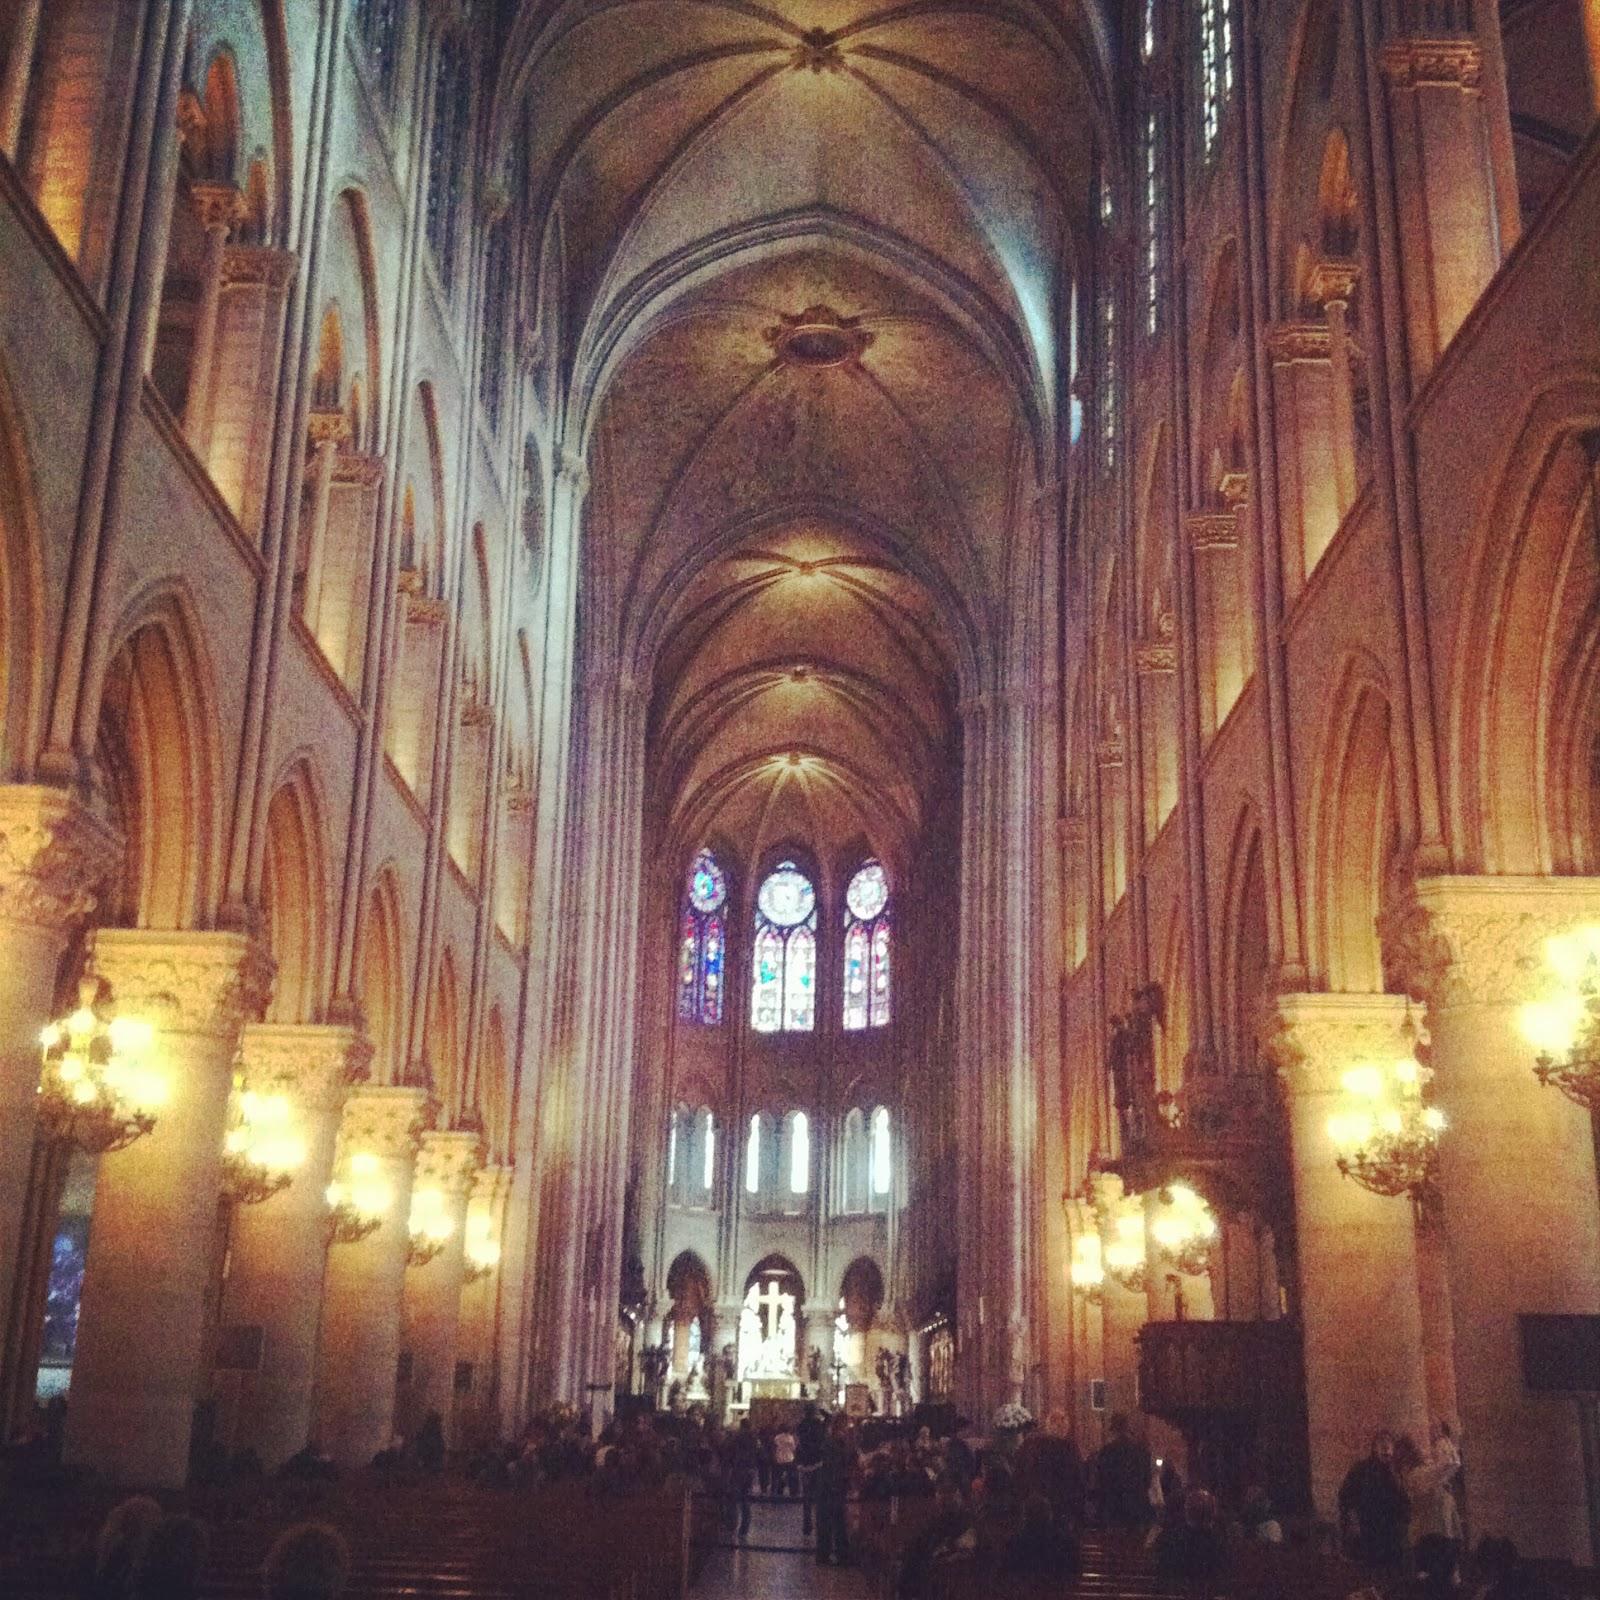 Interior de la Catedral de Notre Dame, Paris